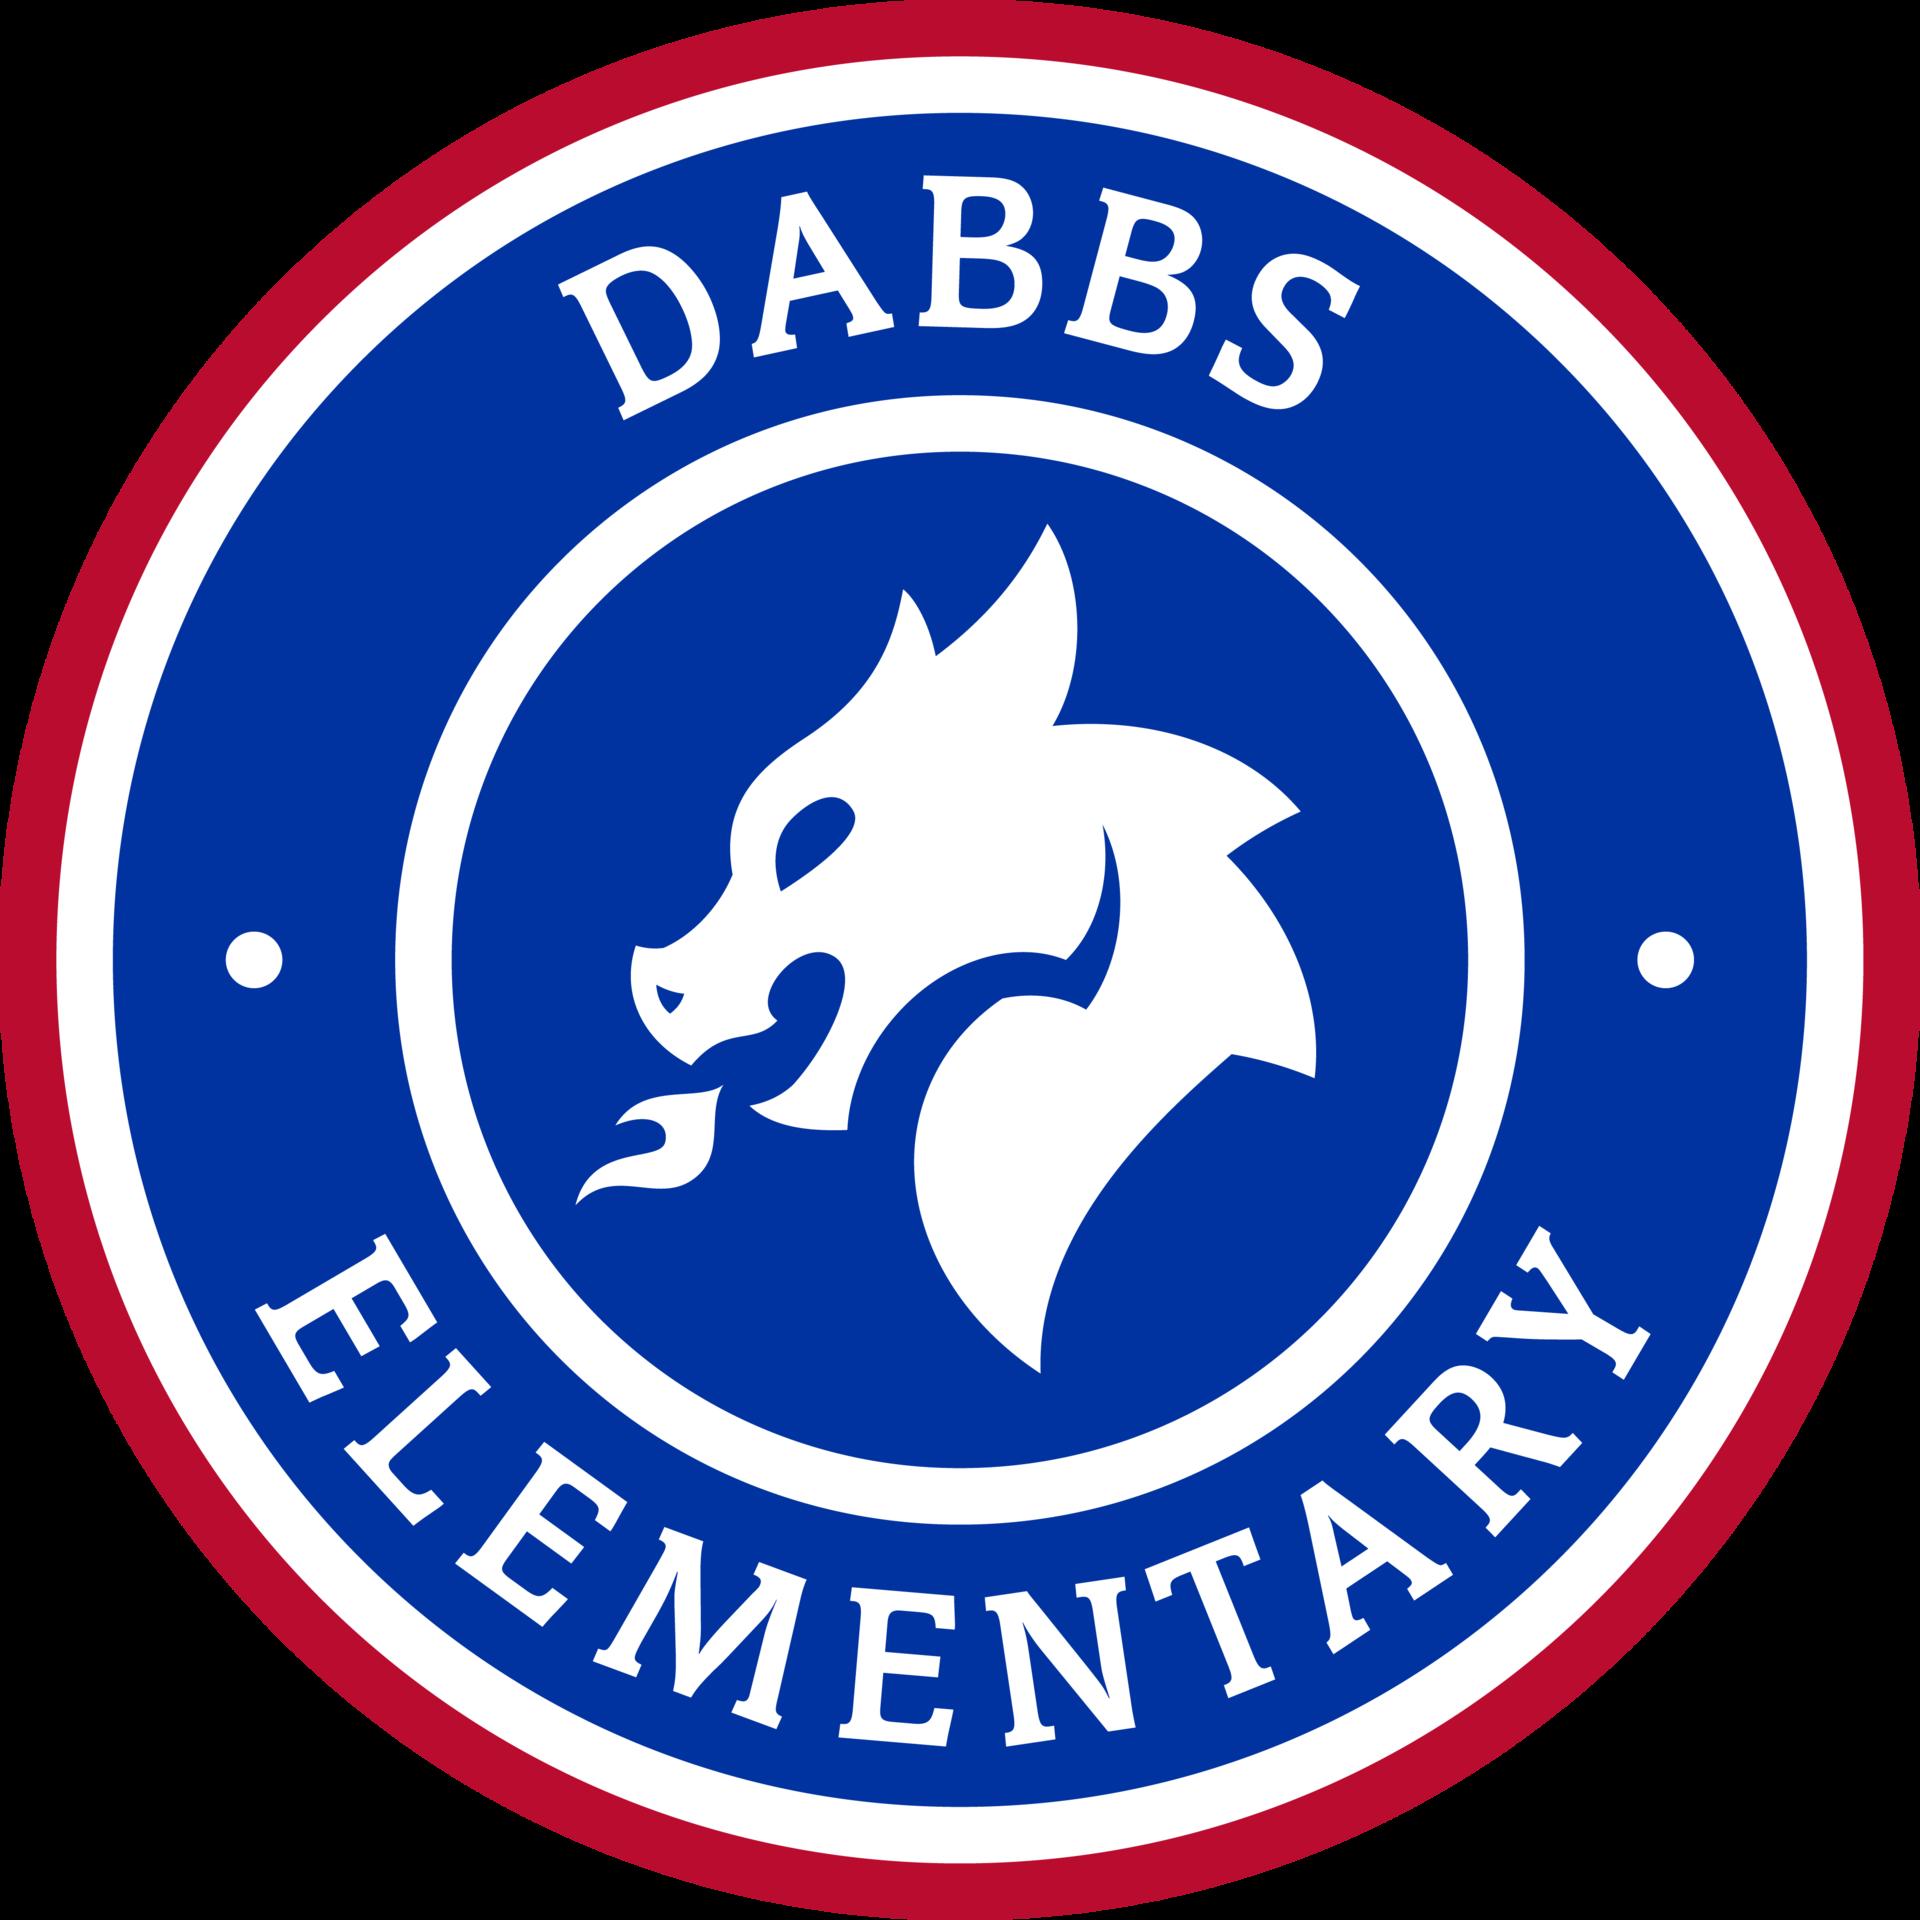 Dabbs Elementary school seal